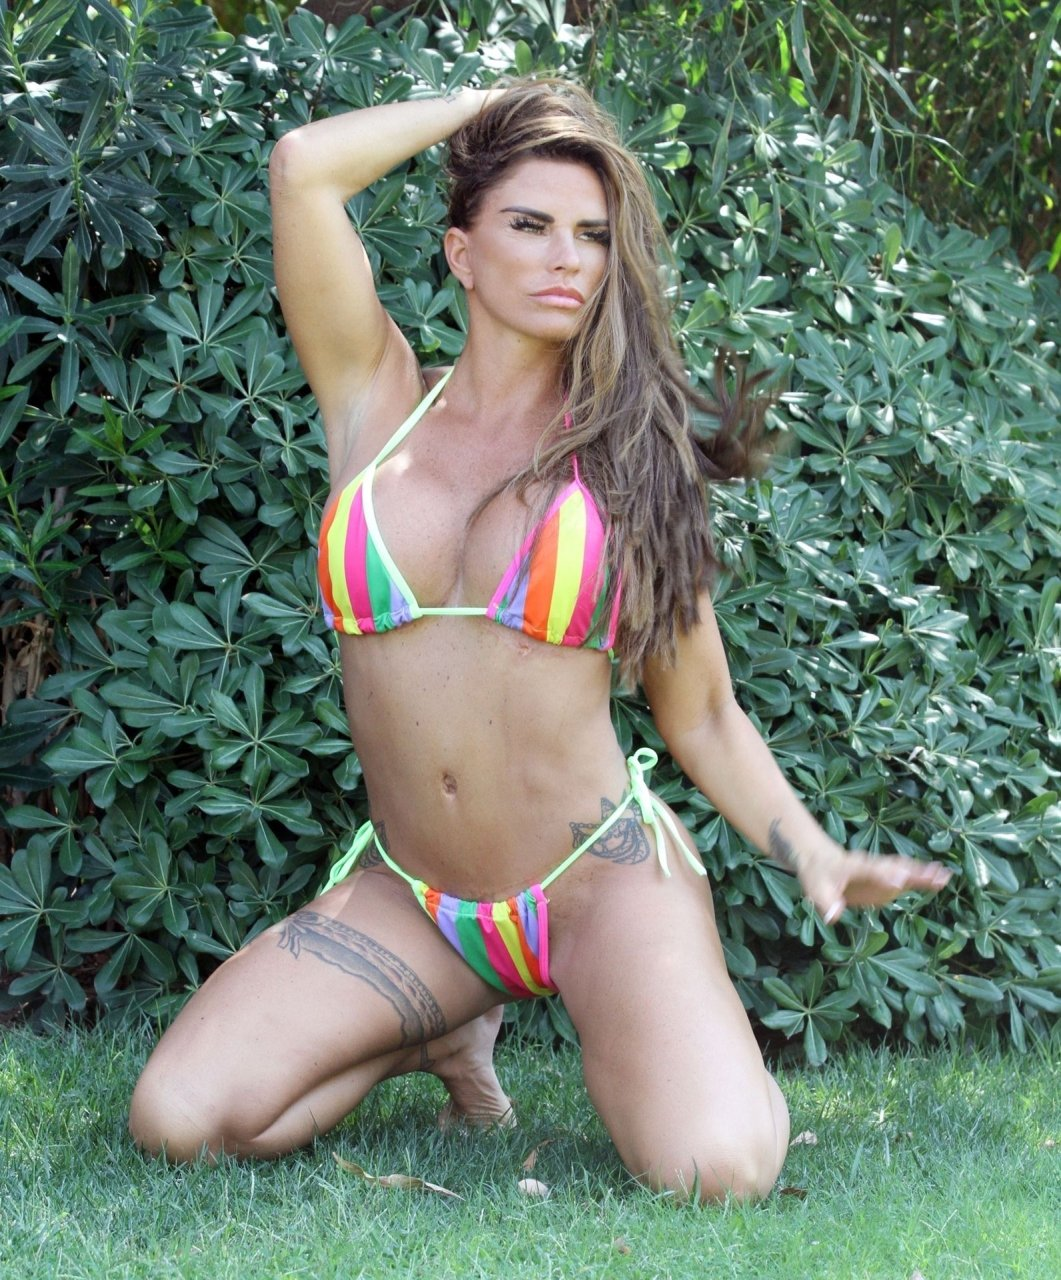 Katie-Price-Nude-Sexy-TheFappeningBlog.com-71.jpg